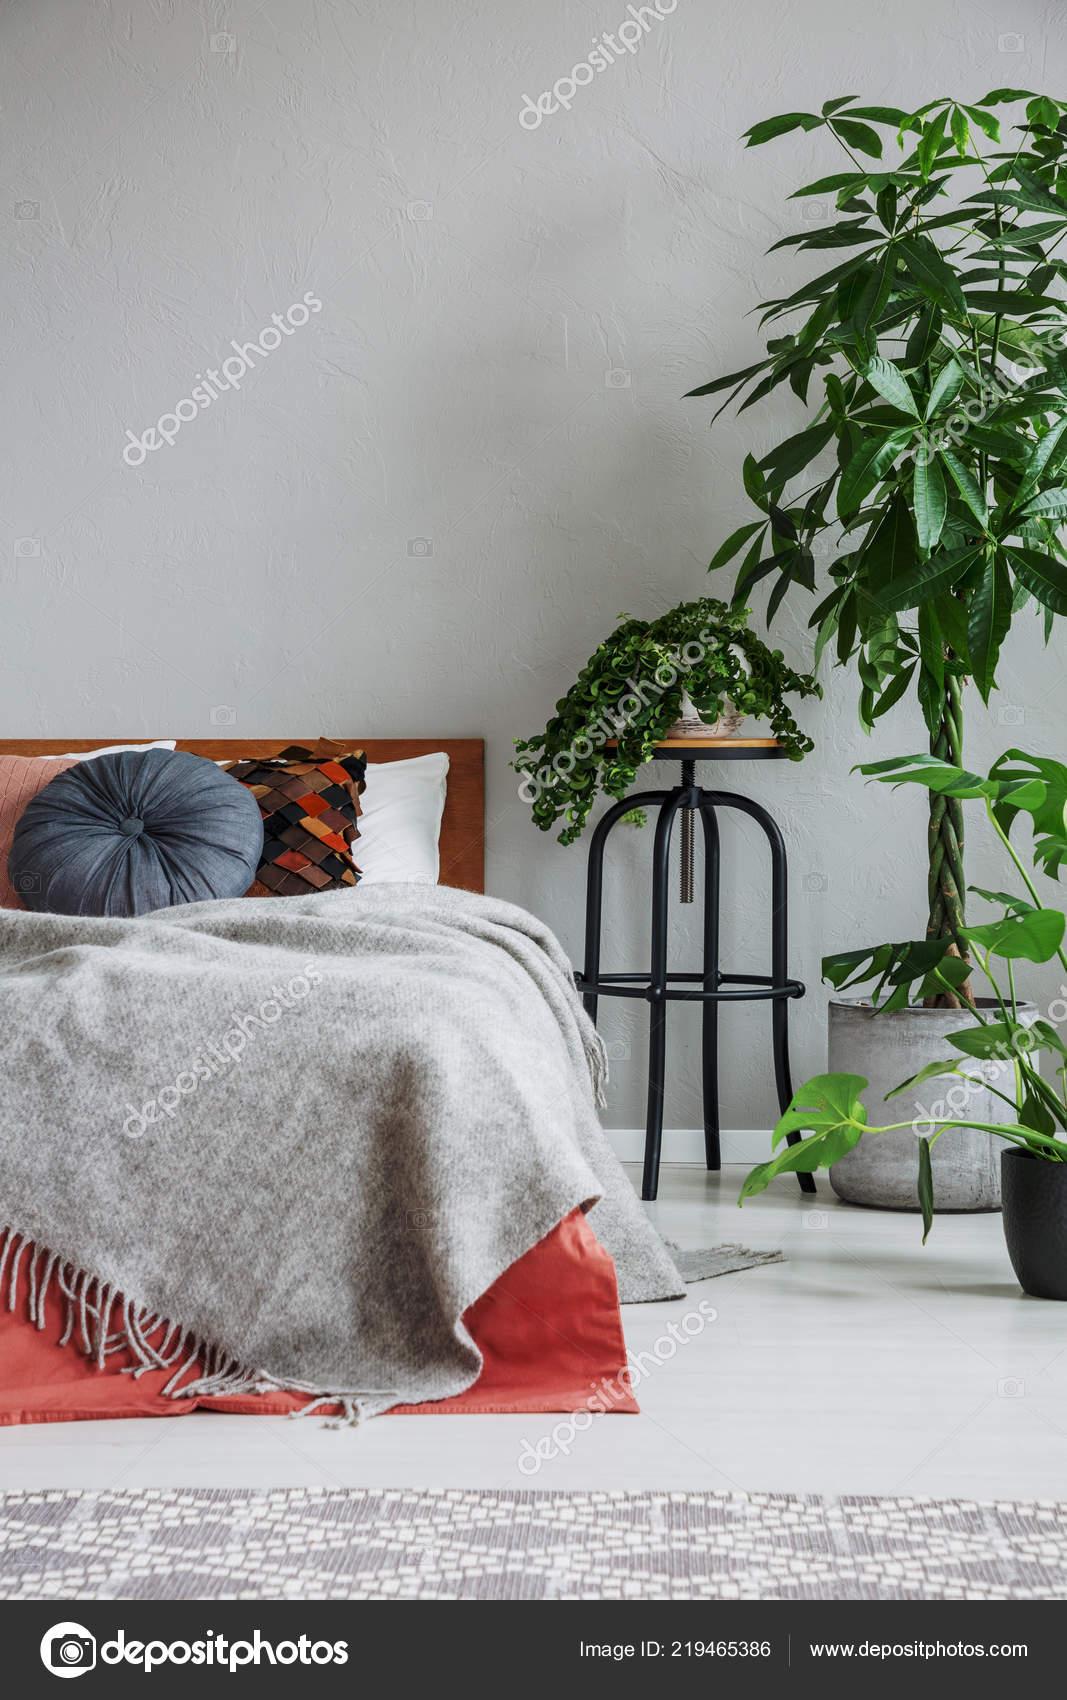 Plants next bed red grey sheets pillows natural bedroom interior stock photo